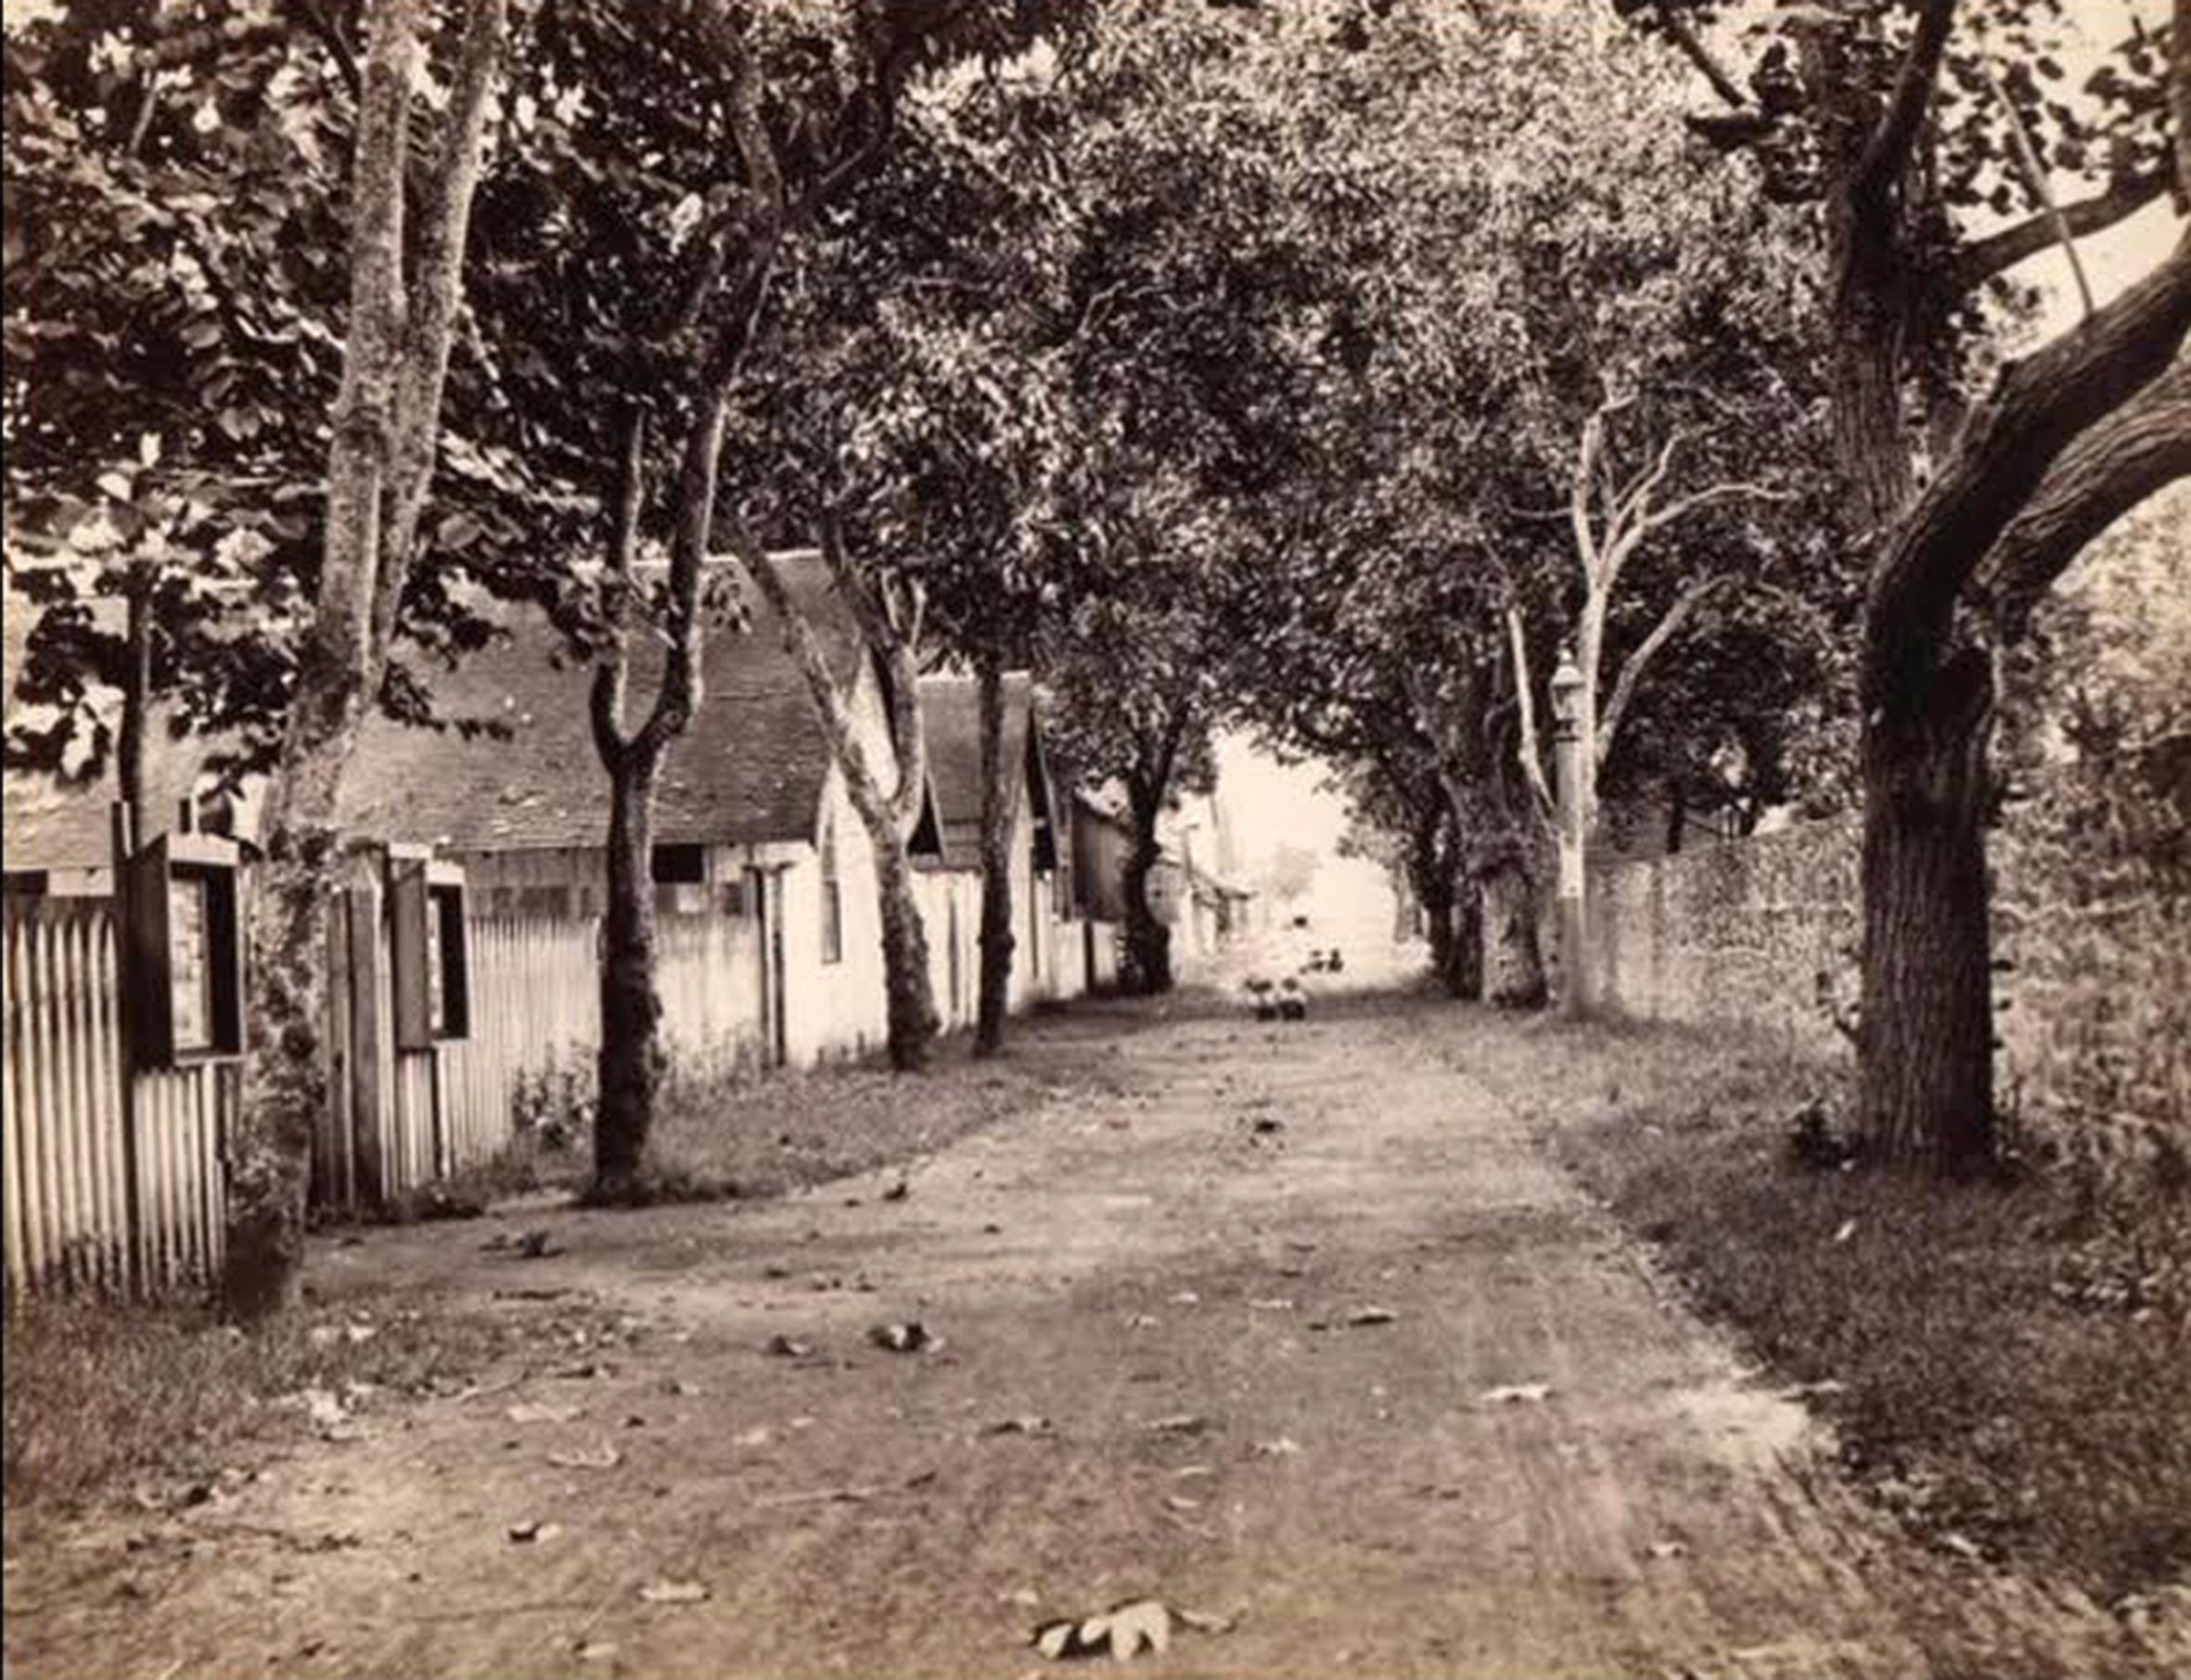 La rue de la Petite-Pologne vers 1890, un chemin de terre très campagnard.